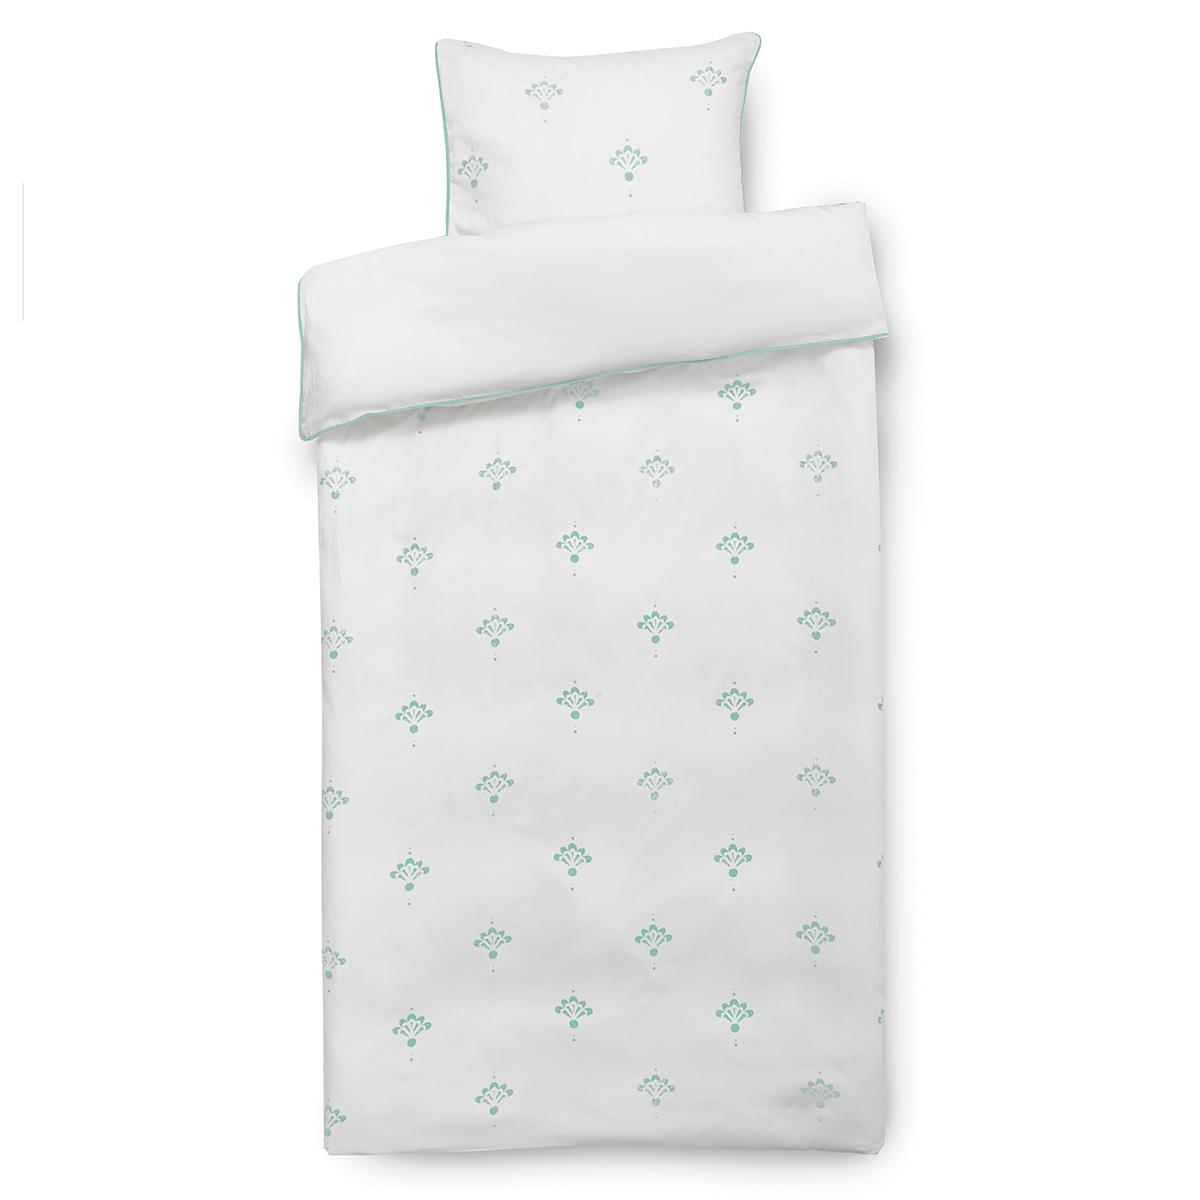 Image of   Isabell Kristensen sengetøj - Hvid og støvet mint